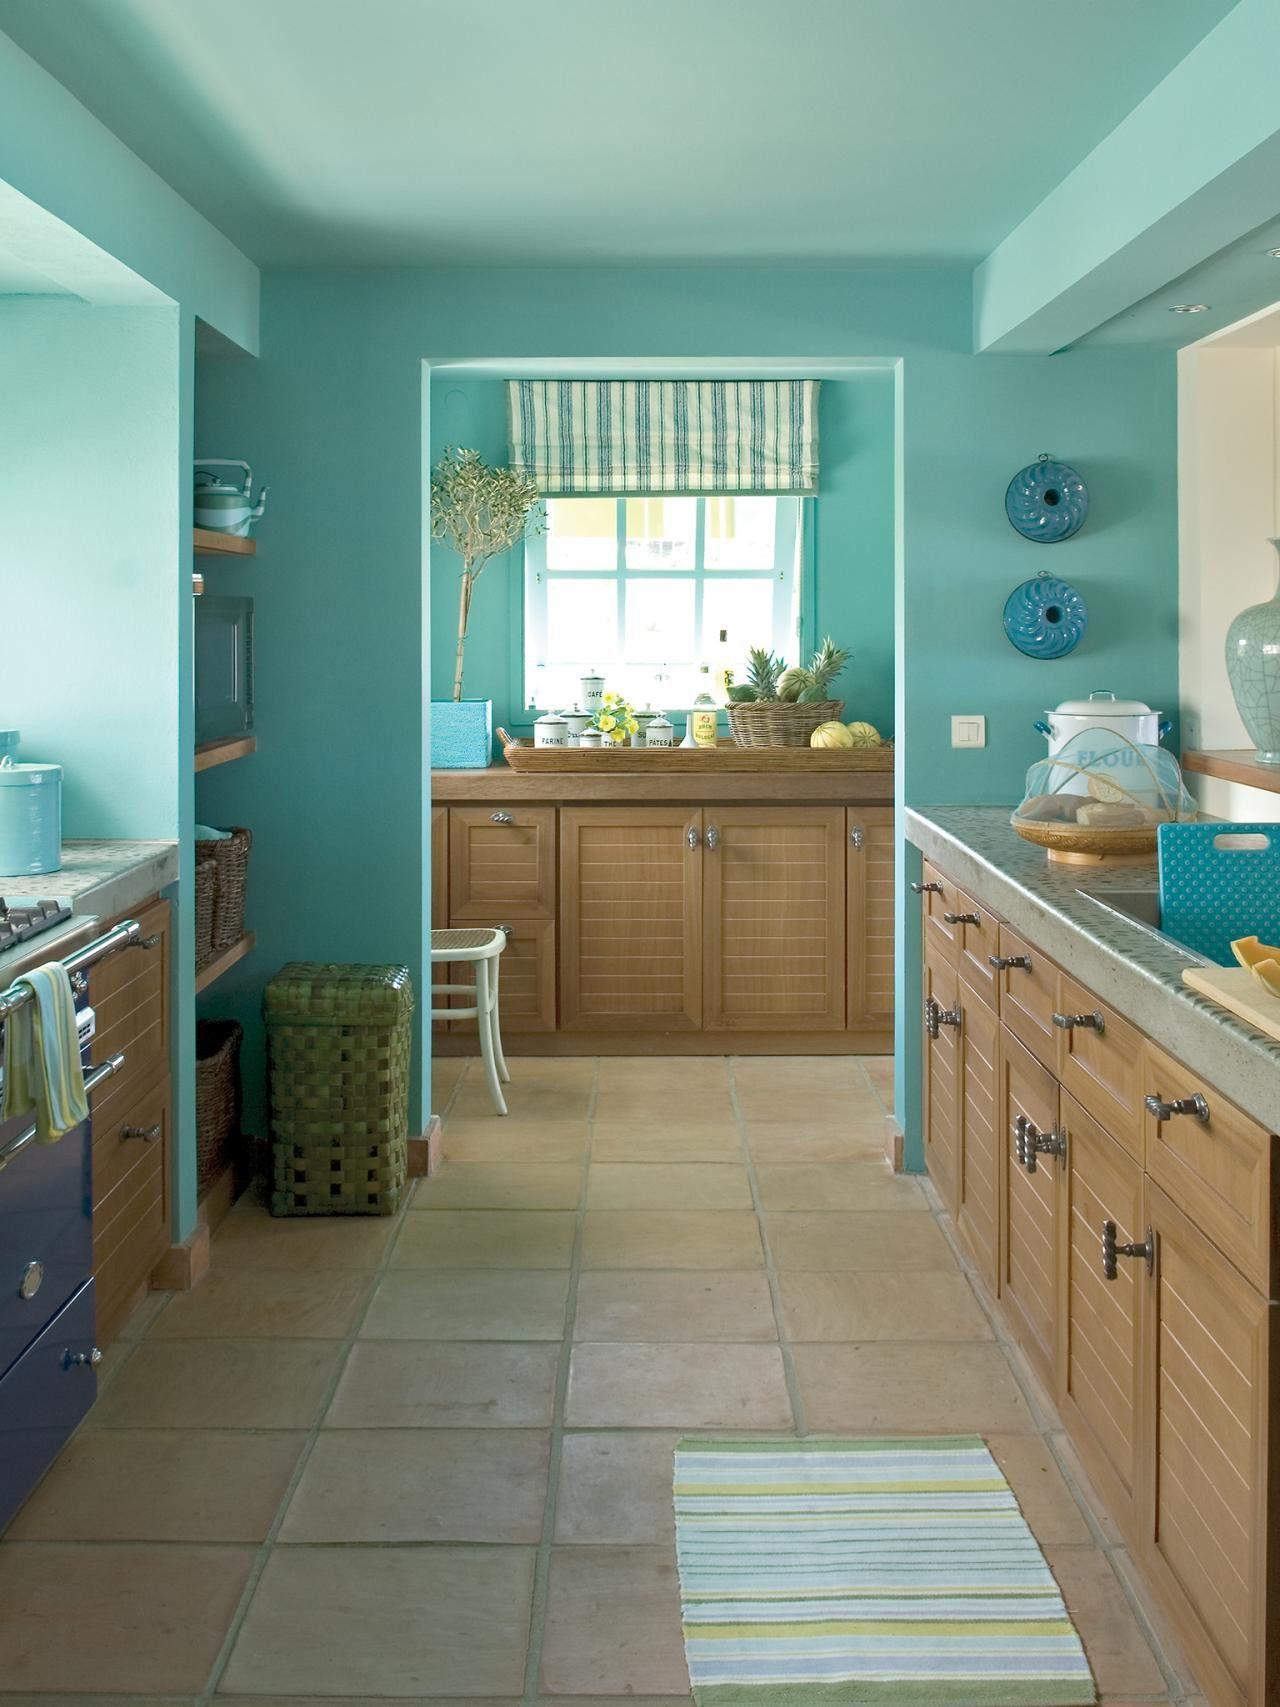 Kitchen Designs Vibrant Colors Paint Colors for Small ...